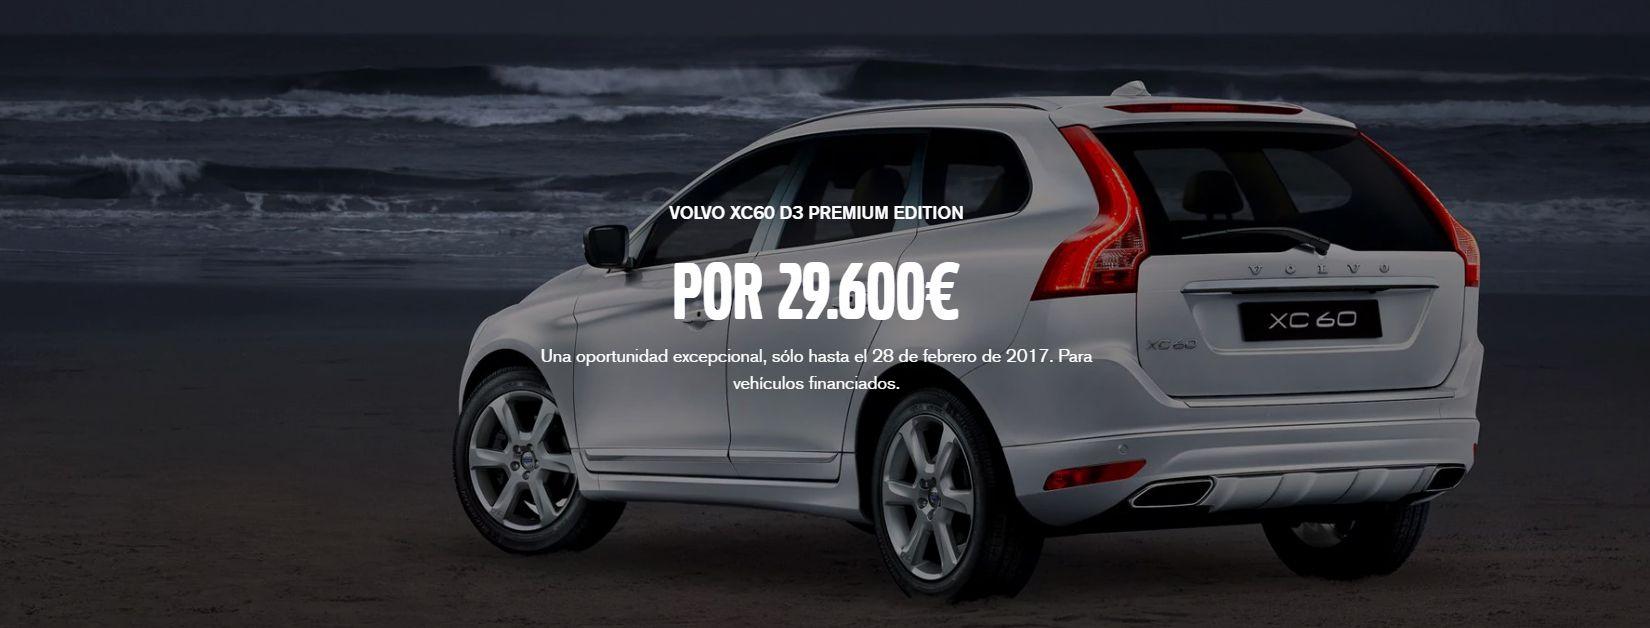 VOLVO XC60 POR 29.600€